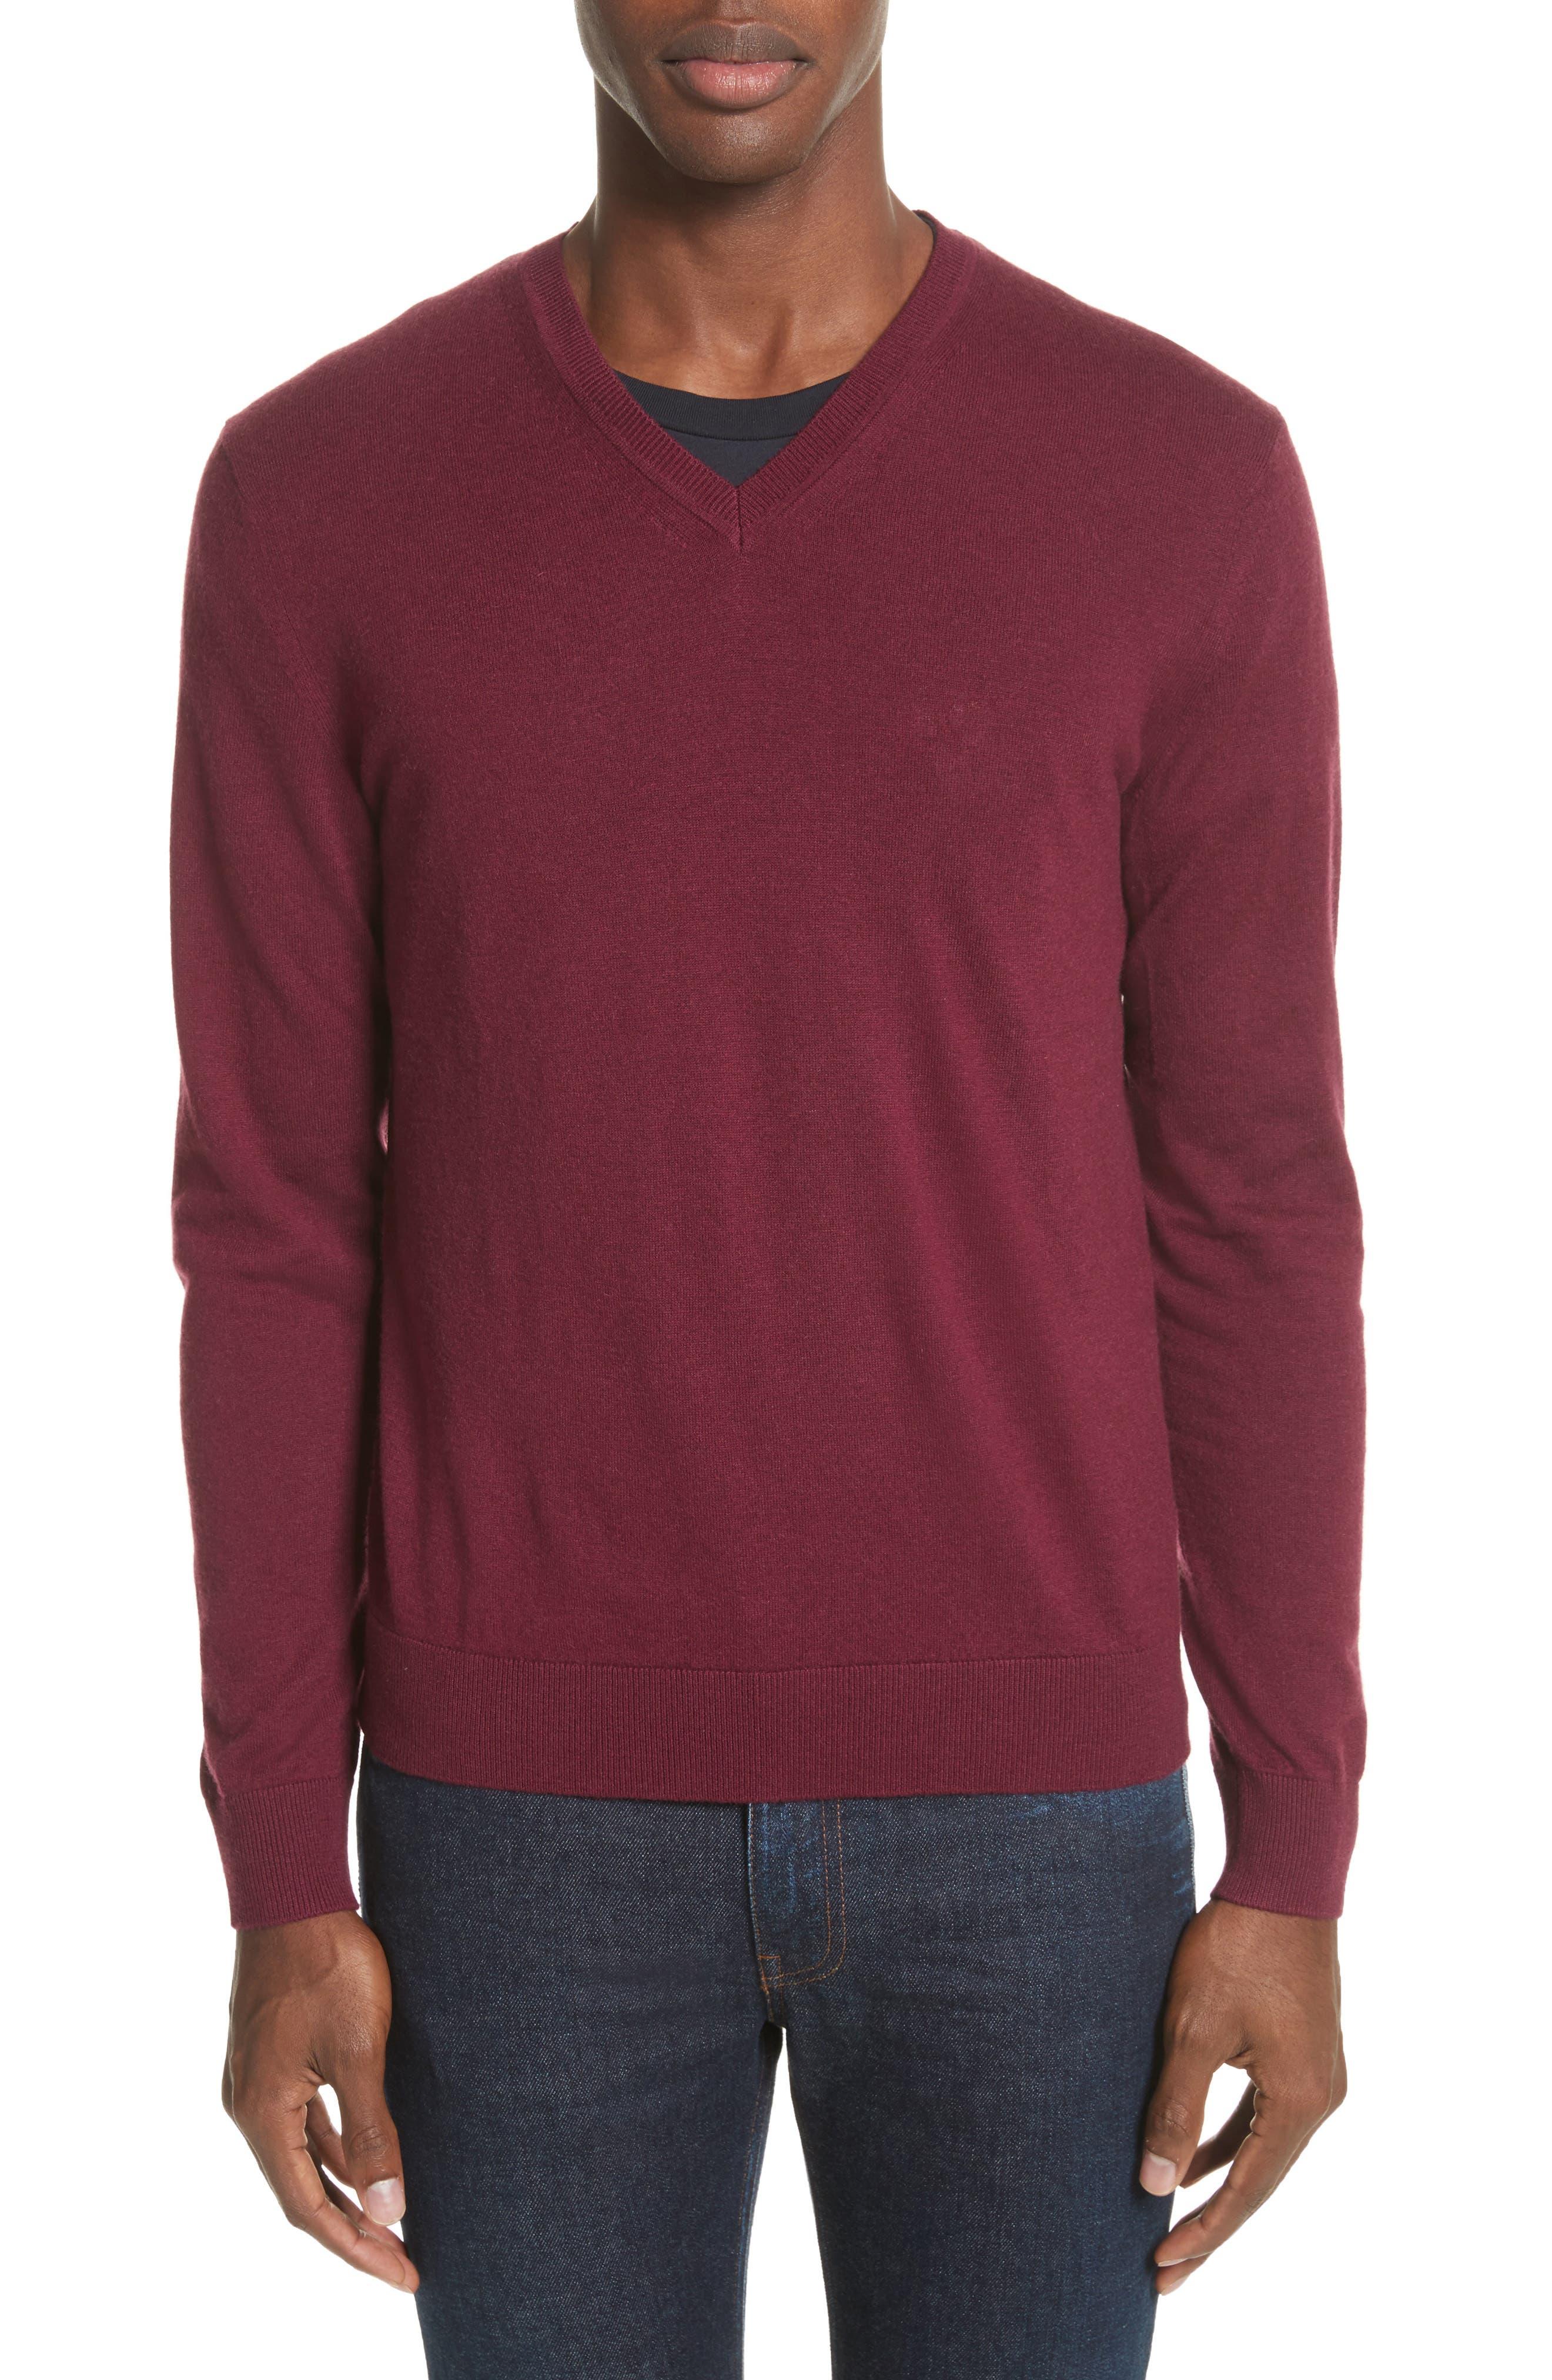 Burberry Randolf Cashmere & Cotton Sweater